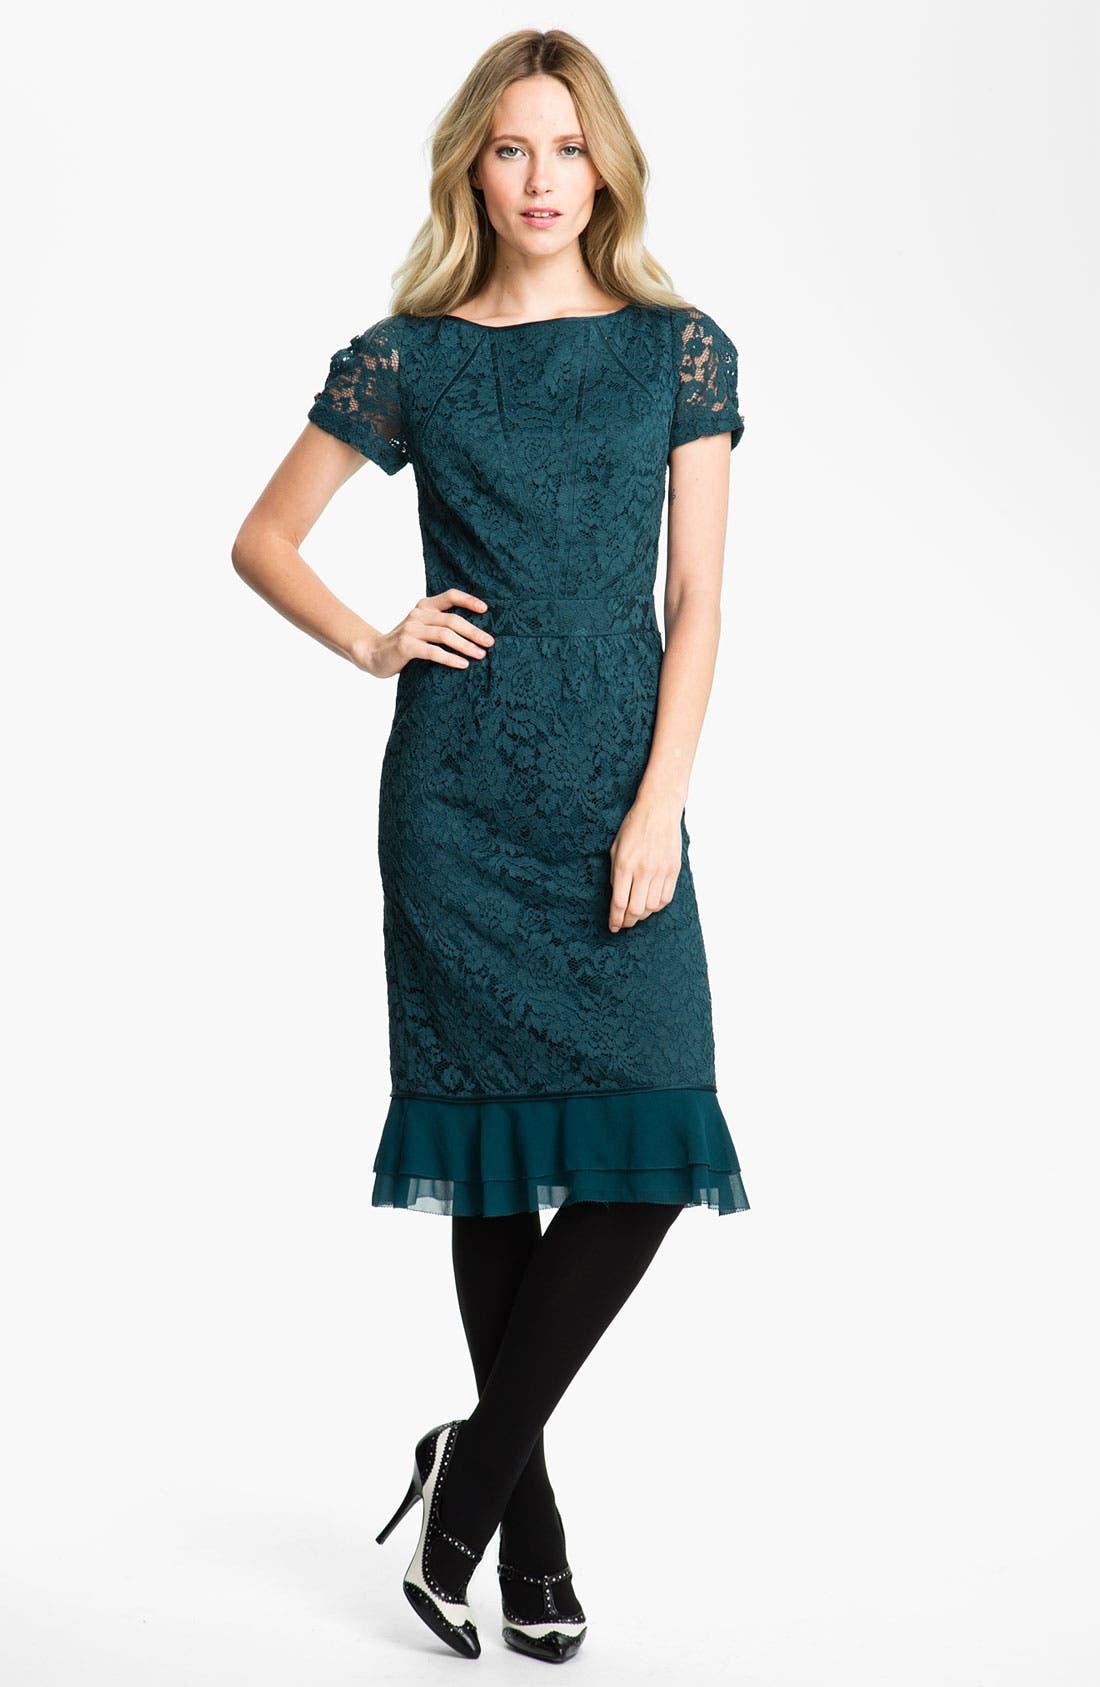 Alternate Image 1 Selected - Tory Burch 'Bovary' Lace Sheath Dress